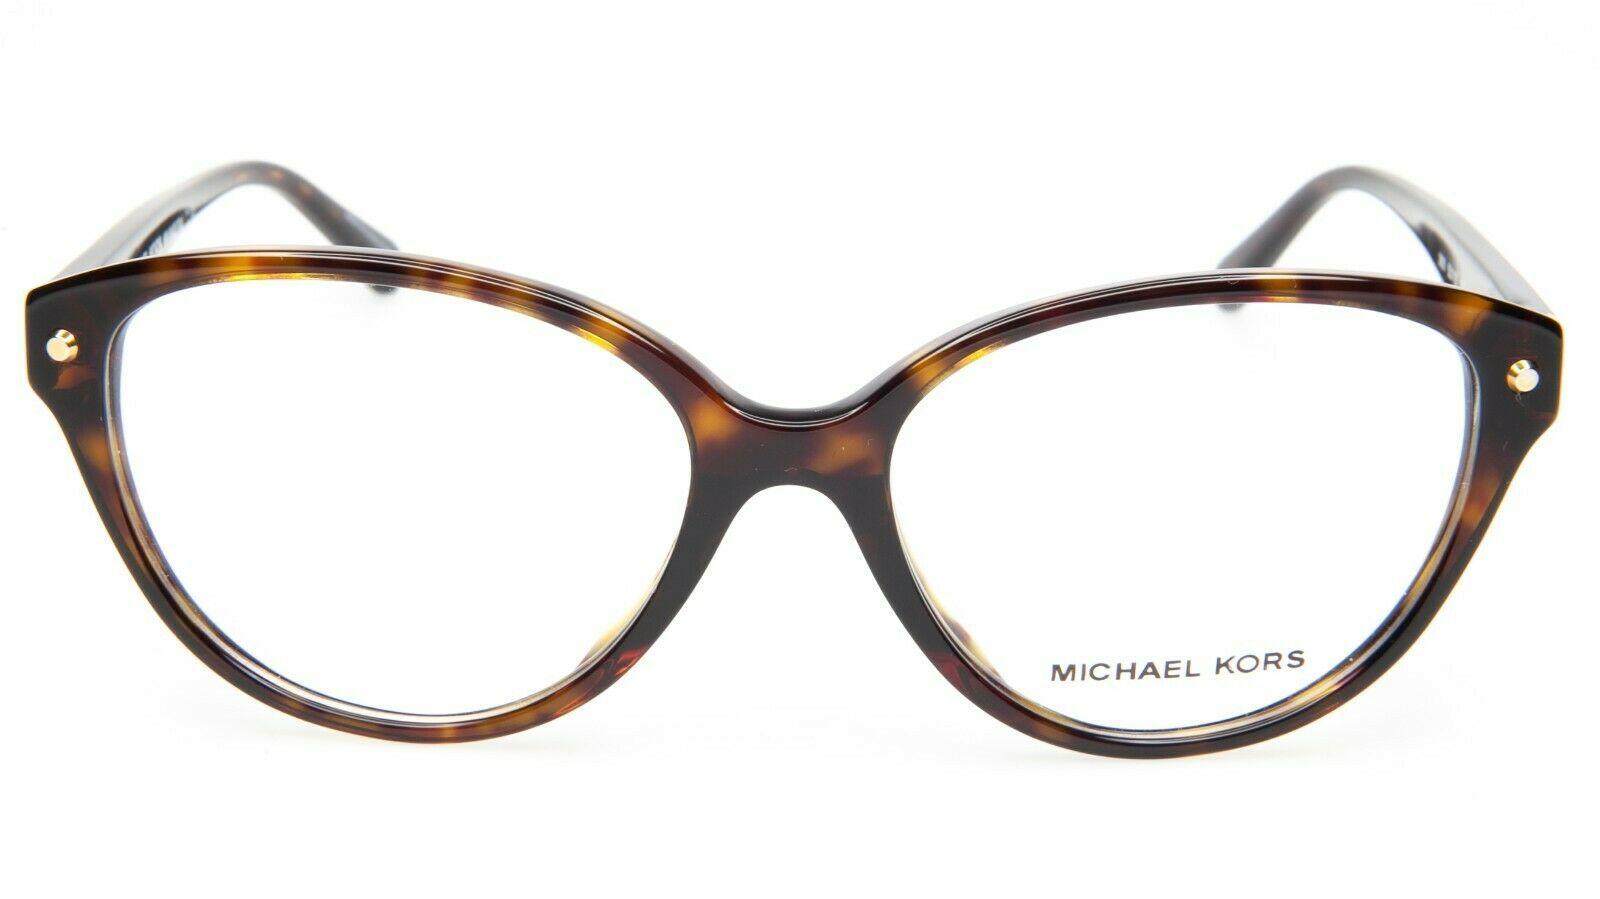 NEW MICHAEL KORS MK4042F Kia 3006 HAVANA TORTOISE EYEGLASSES FRAME 53-16-135 B41